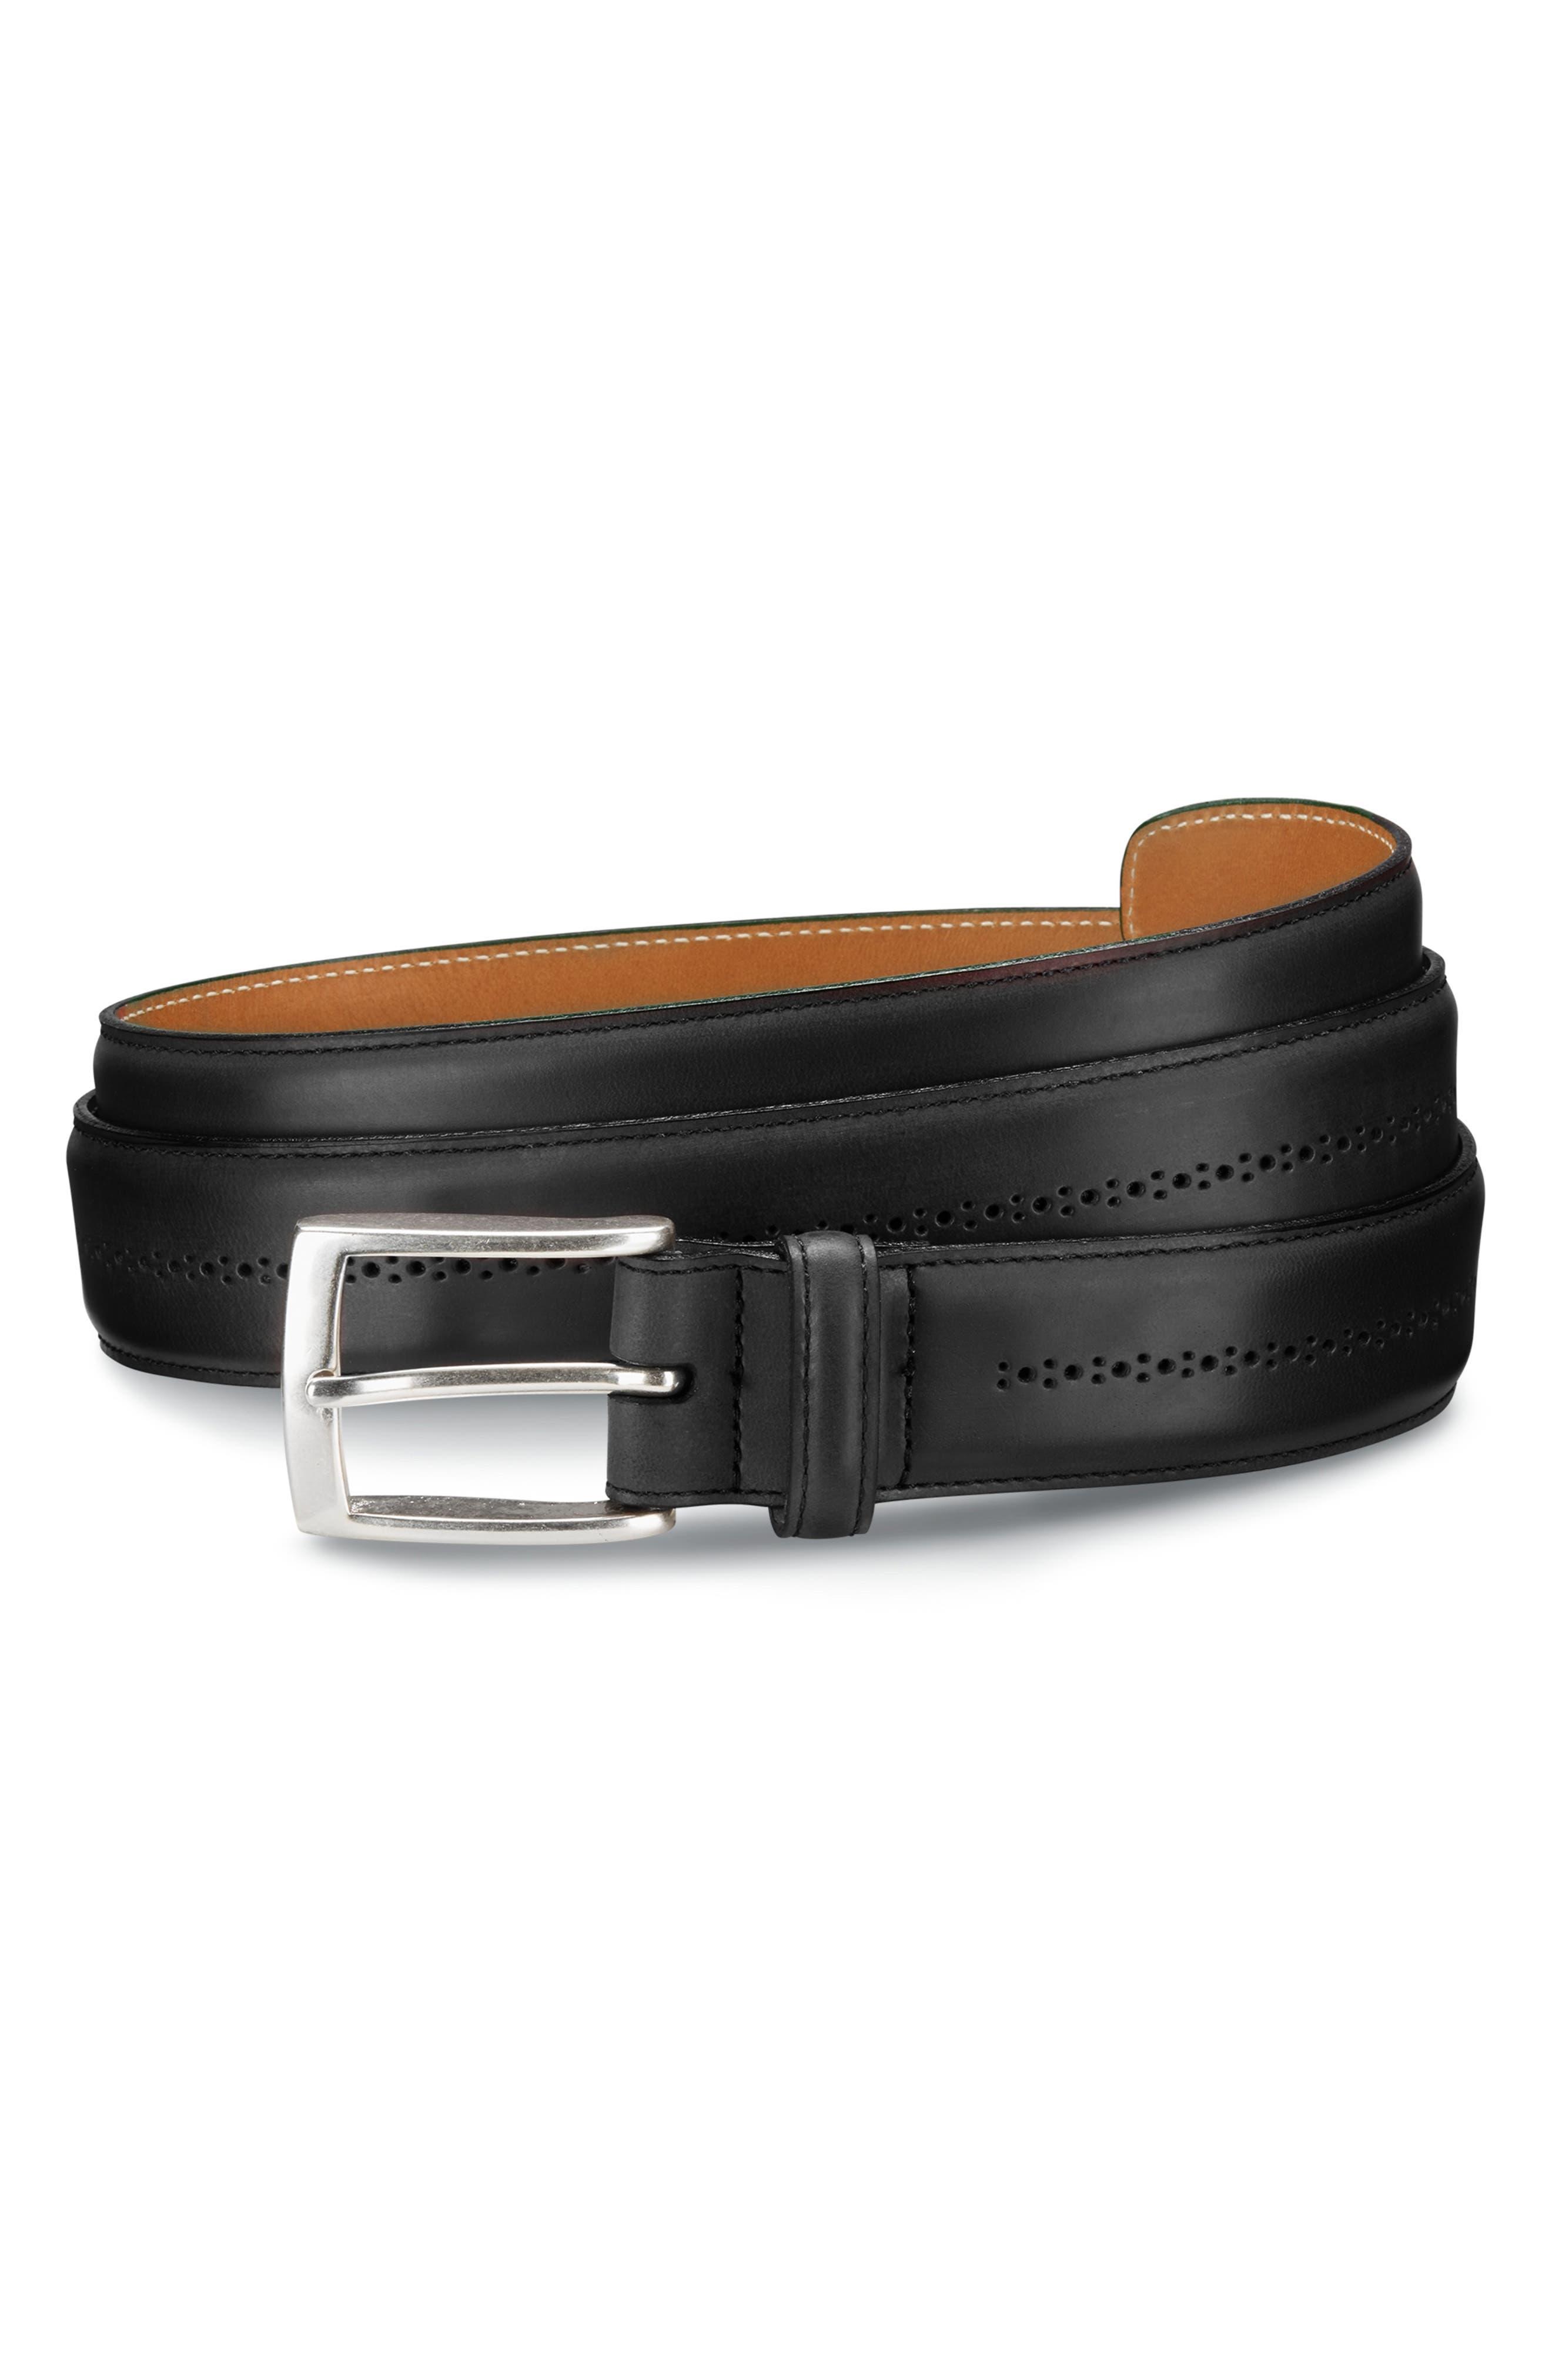 ALLEN EDMONDS, Mackey Ave Leather Belt, Main thumbnail 1, color, 001